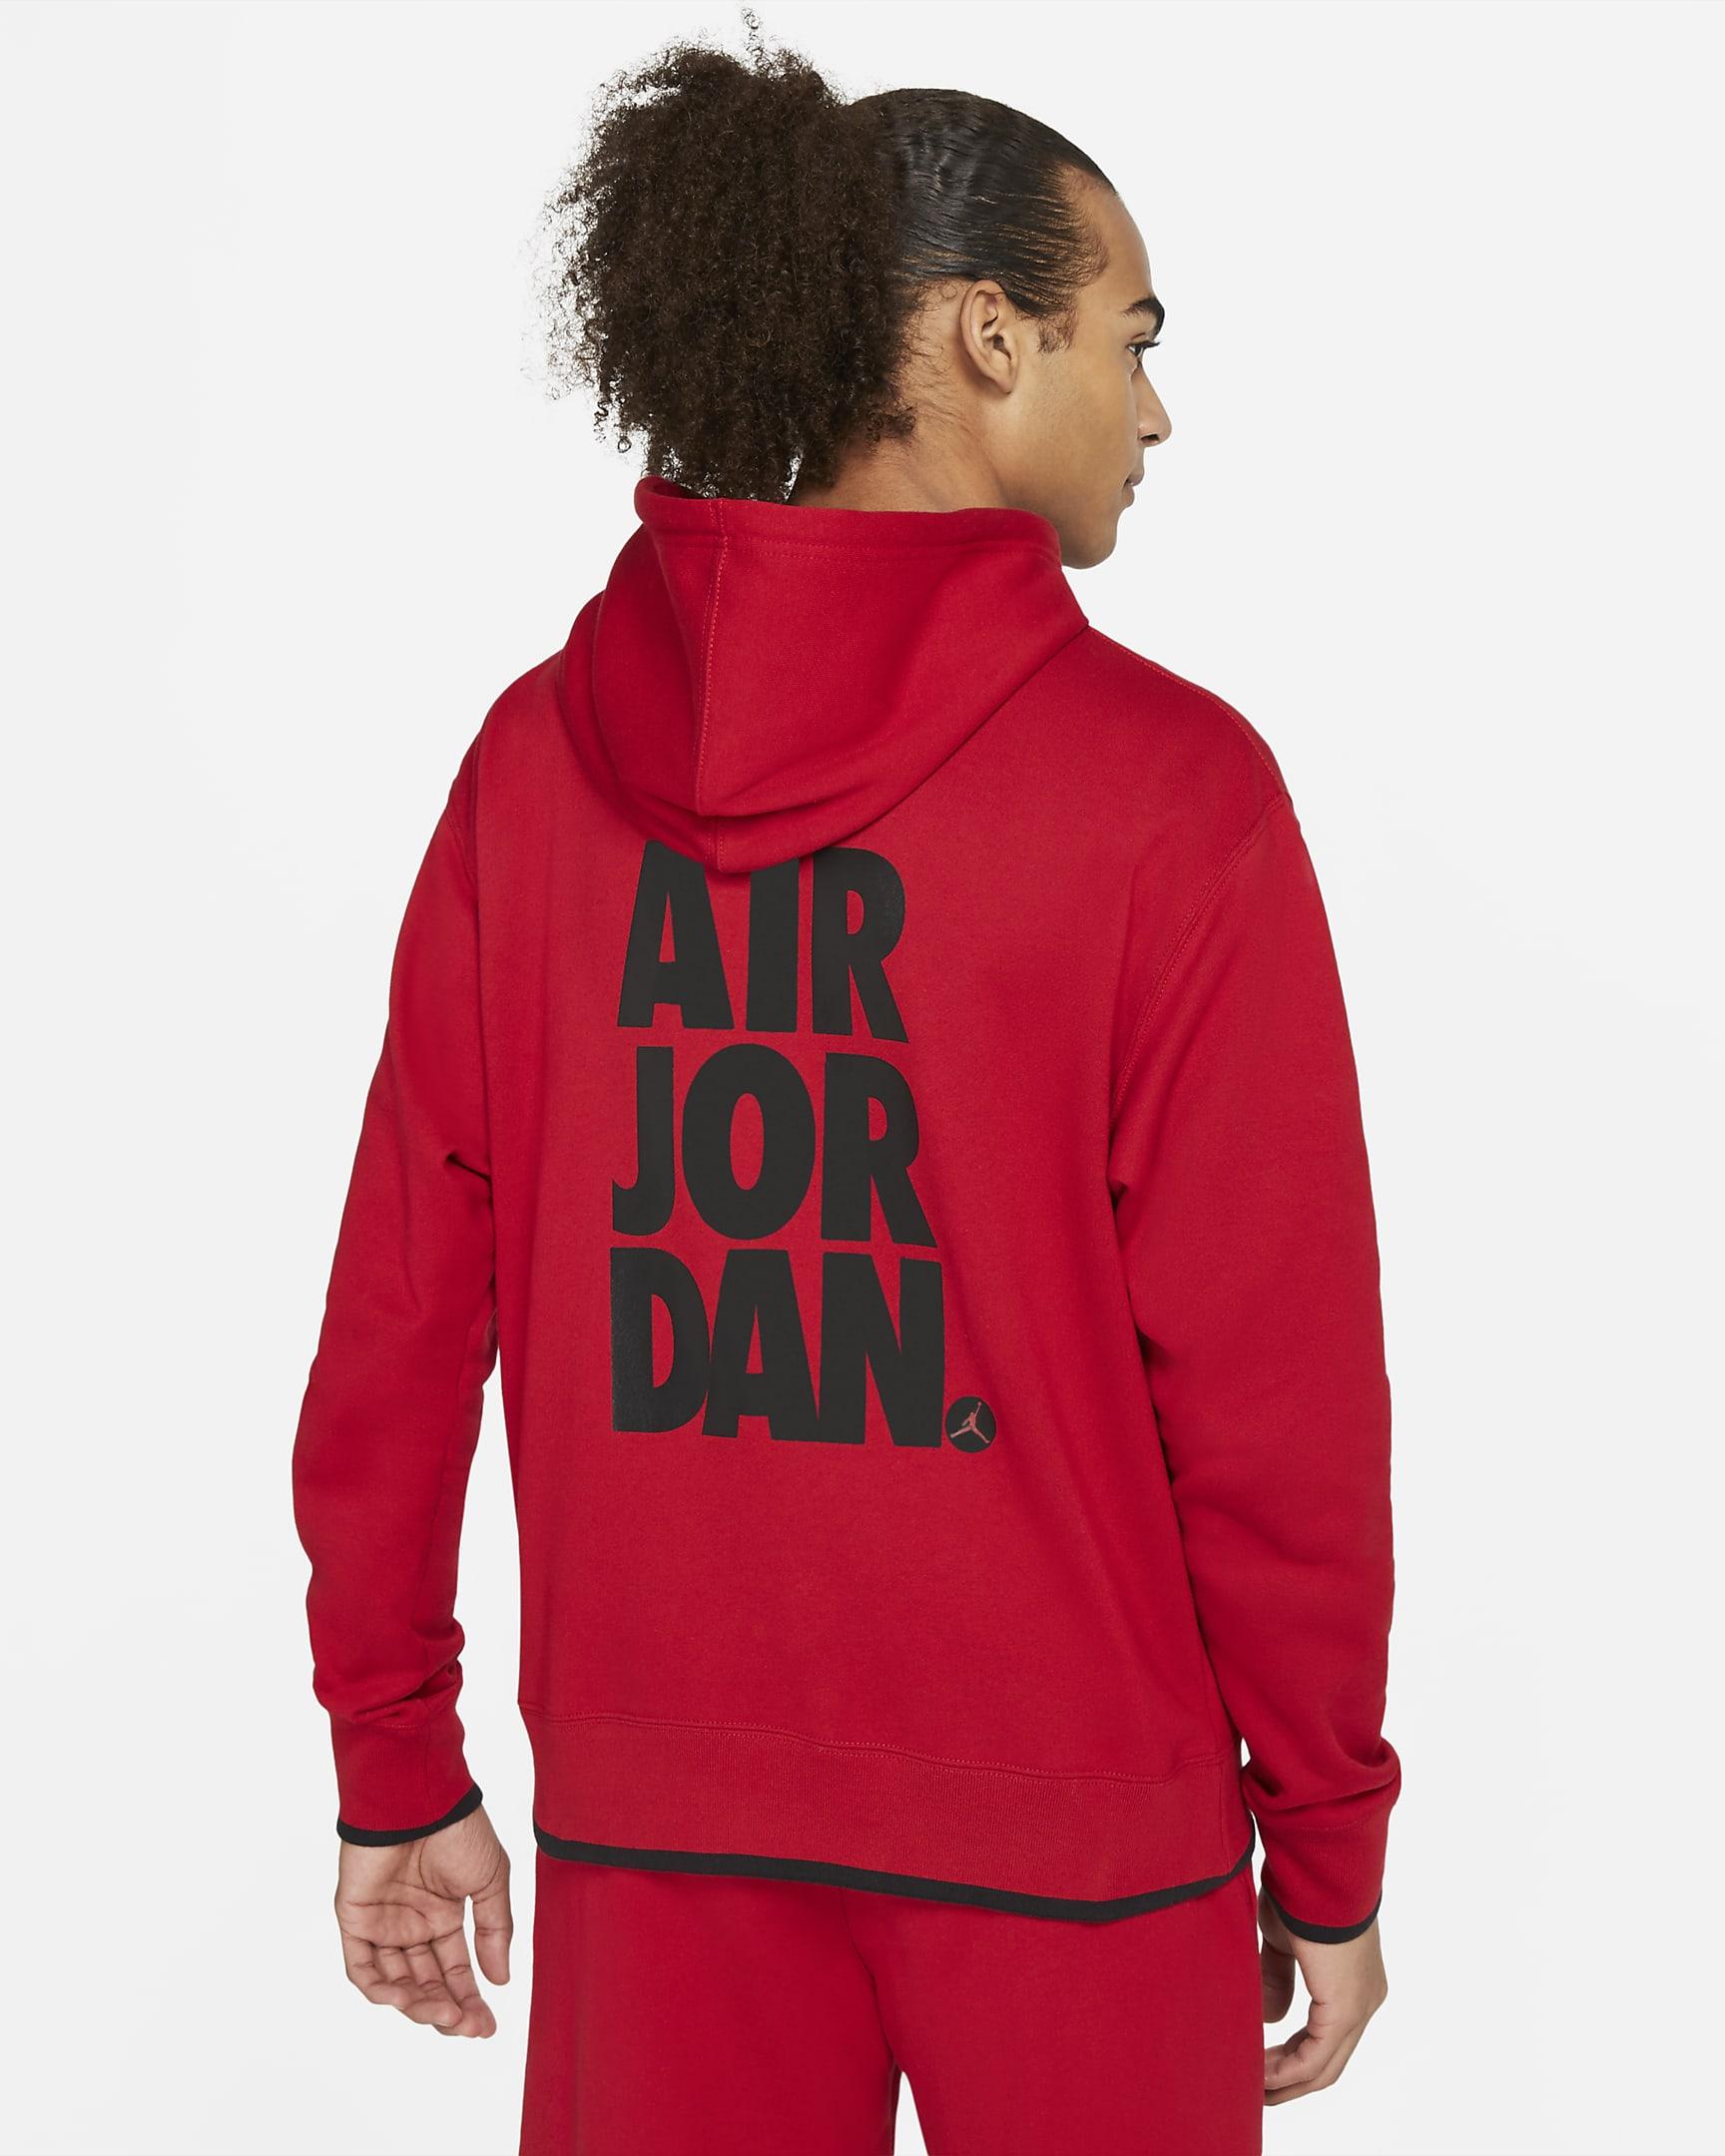 jordan-jumpman-classics-mens-printed-fleece-pullover-hoodie-hz0Q9t-1